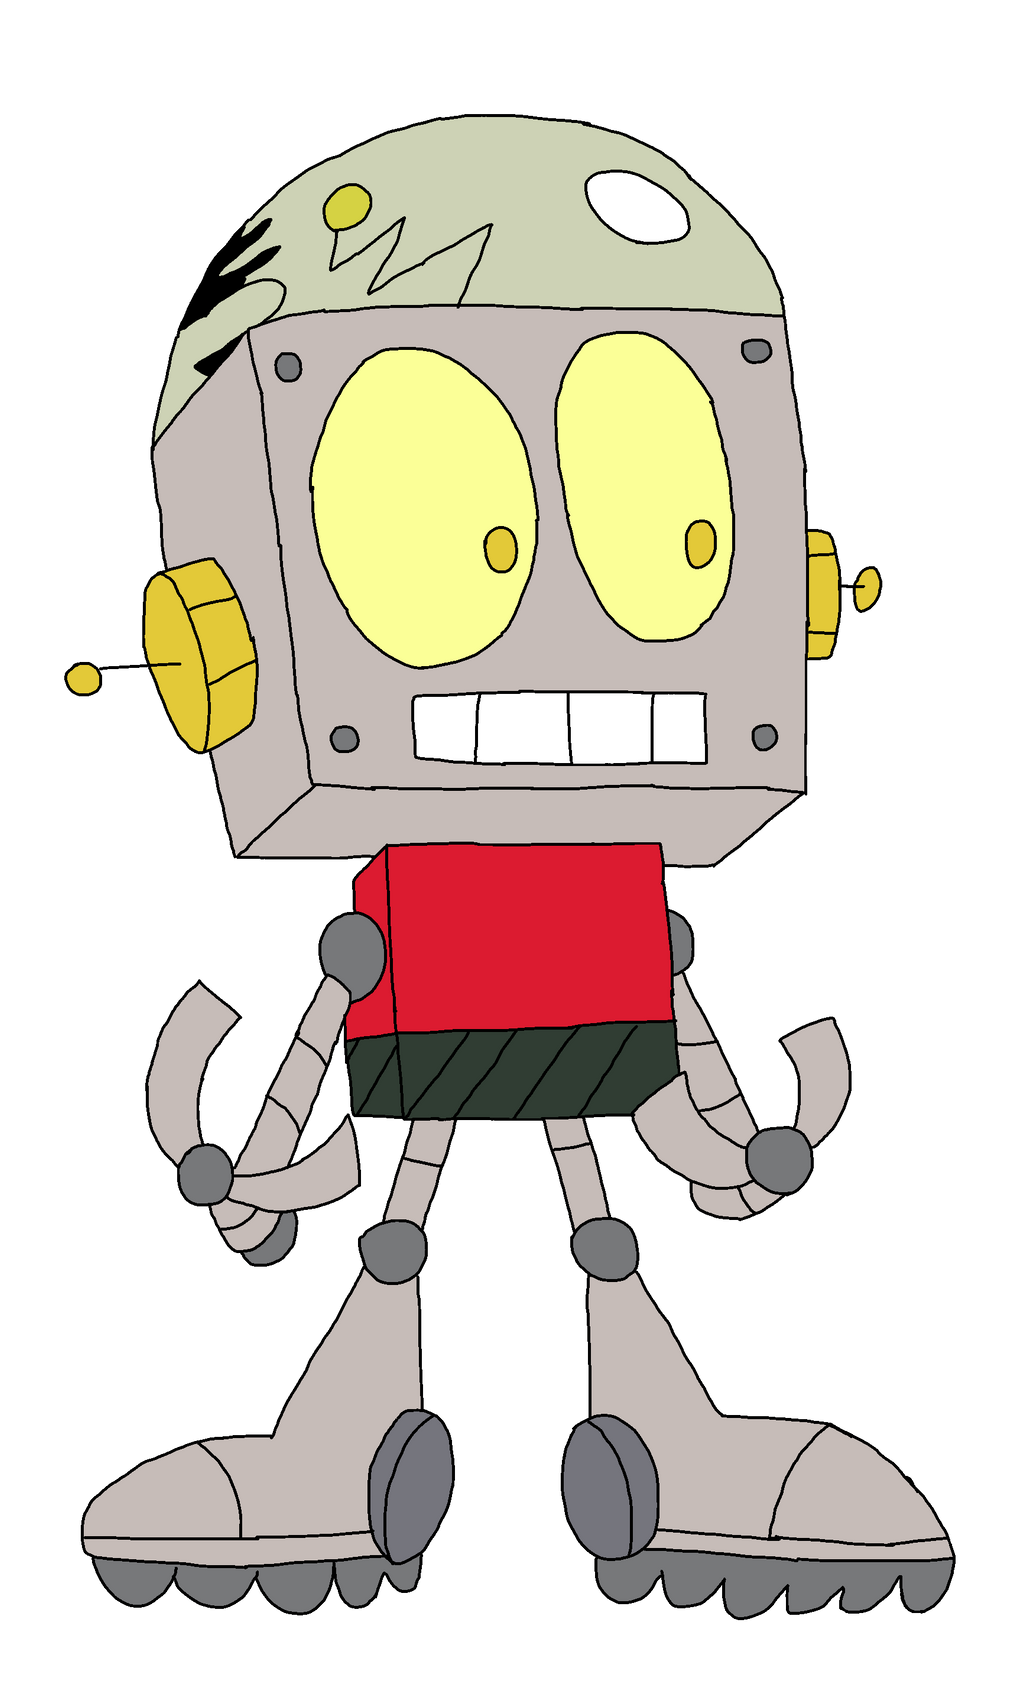 Robot Jones in ok ko art style by Kabutopsthebadd on